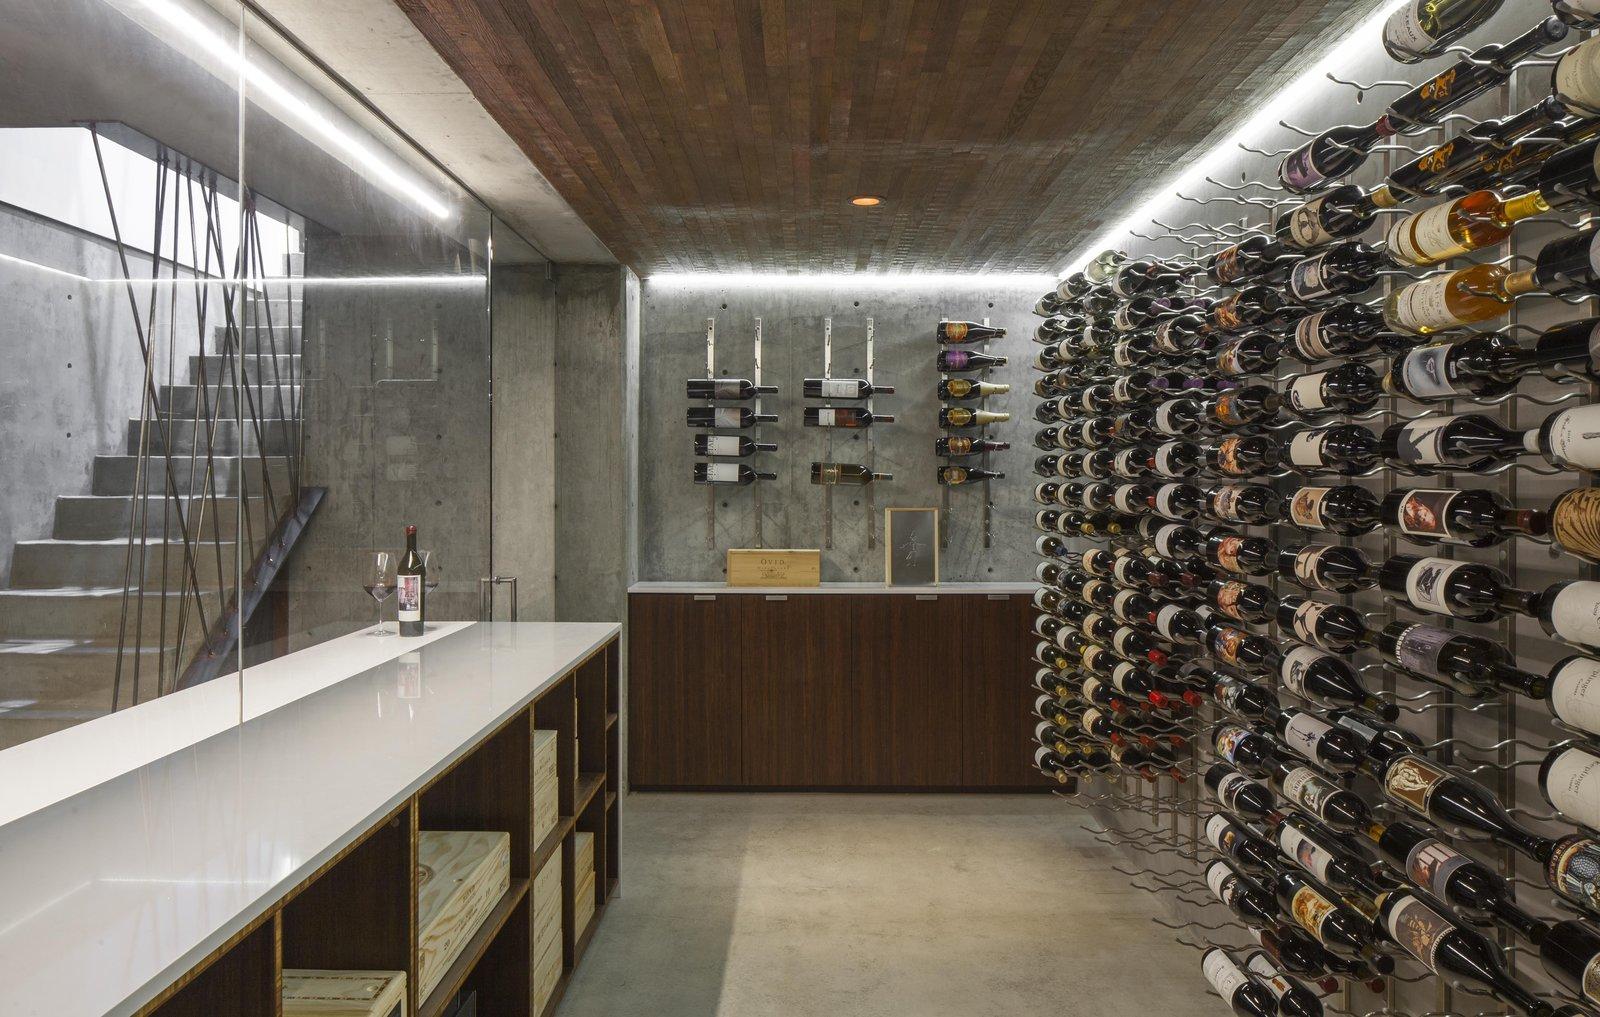 Kitchen, Accent Lighting, Quartzite Counter, Beverage Center, Wine Cooler, Concrete Backsplashe, and Concrete Floor  Dawnsknoll by Minarc